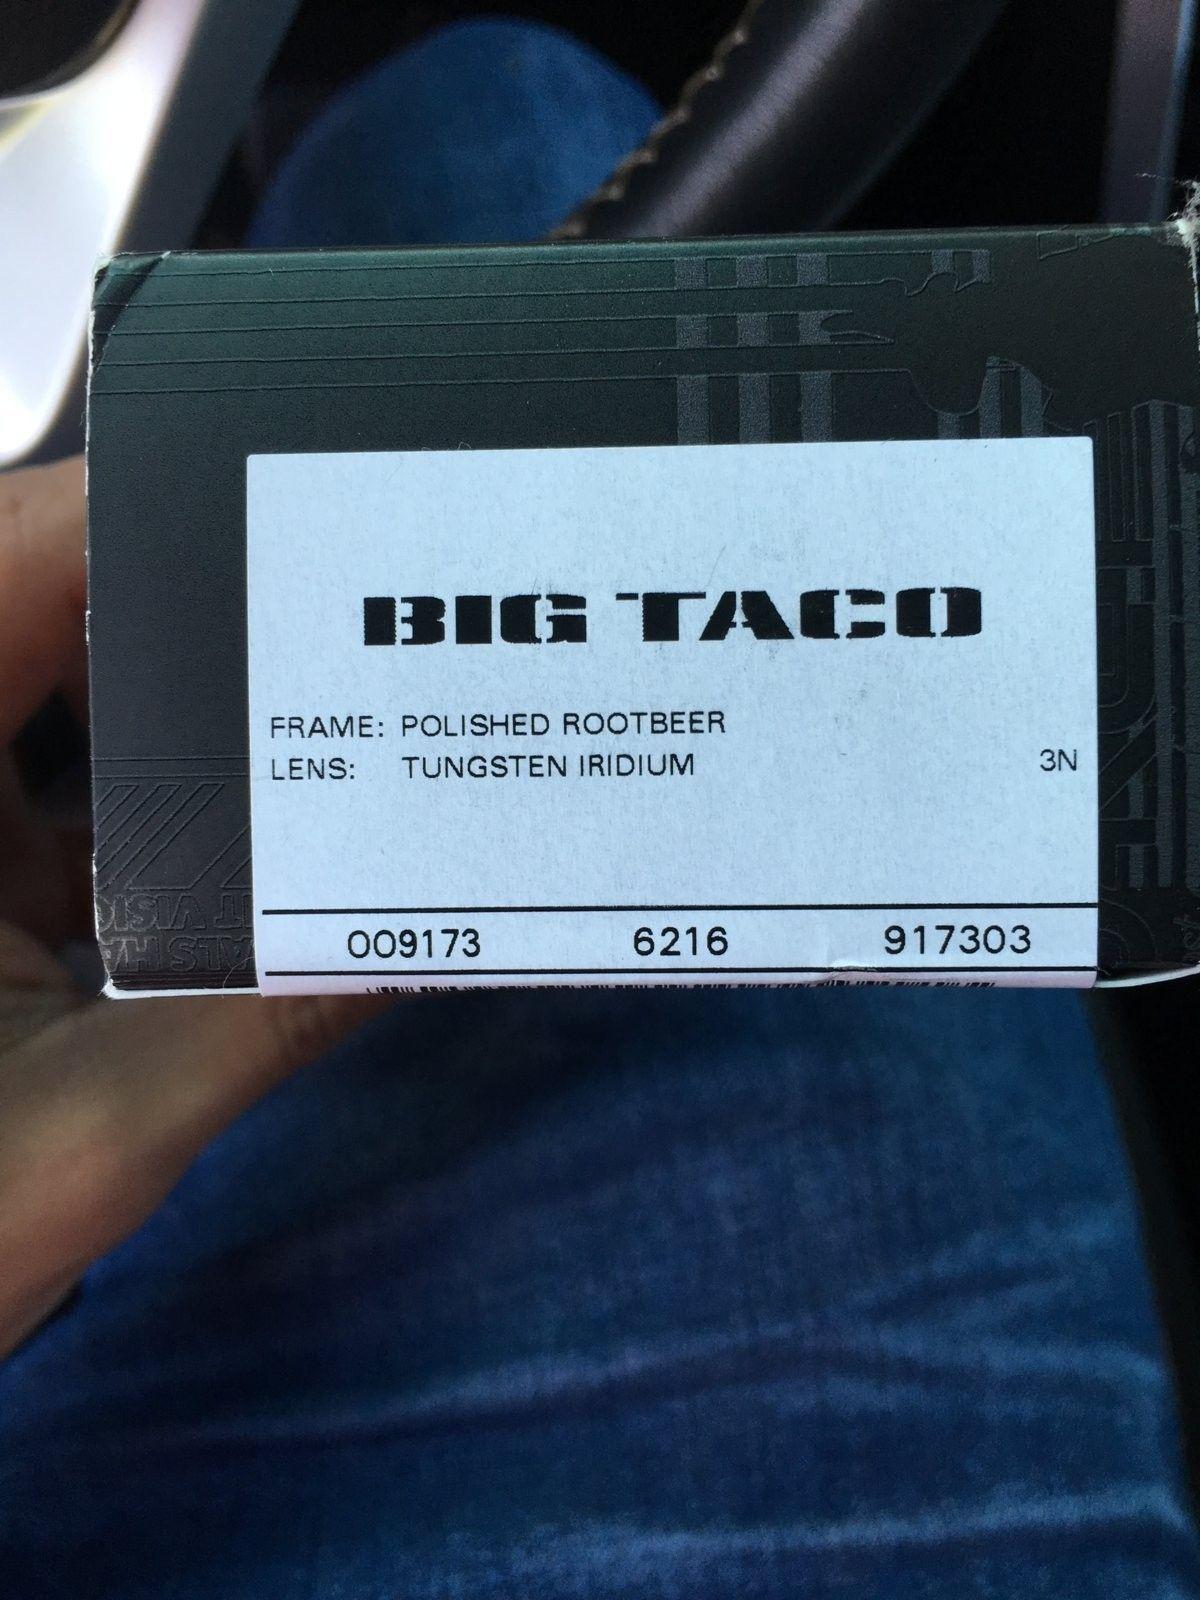 Big taco - image.jpeg